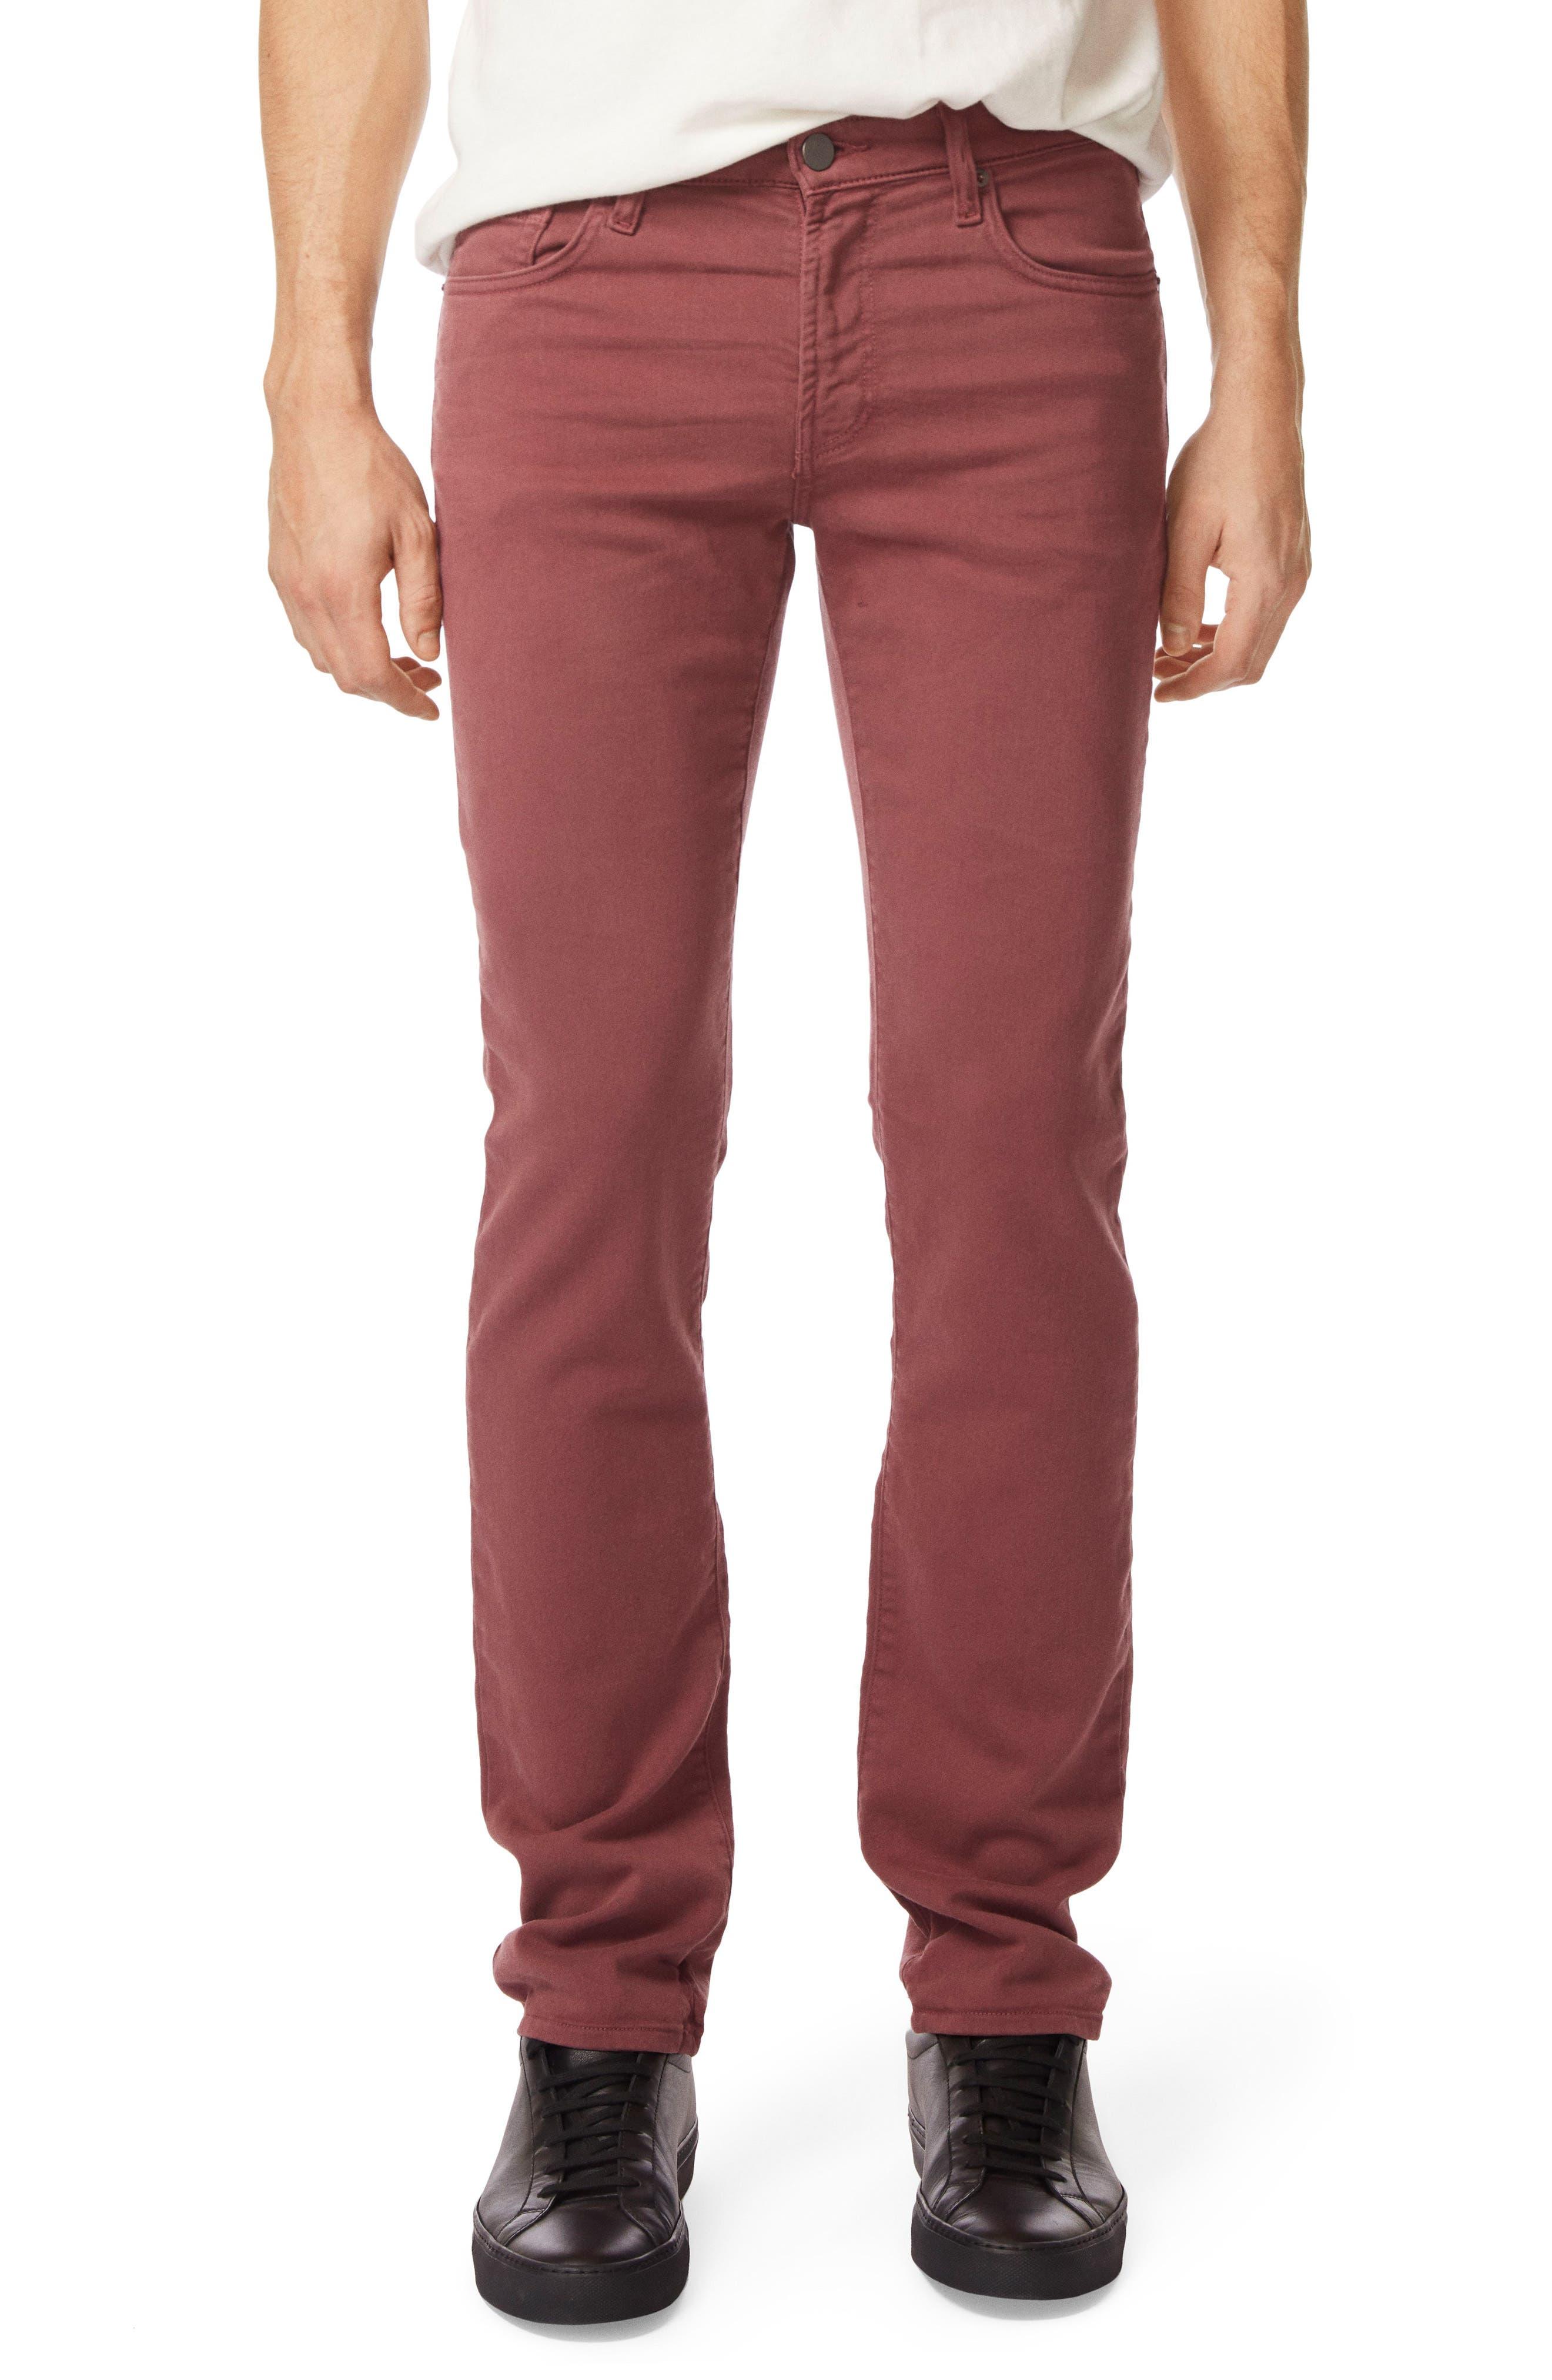 Kane Slim Straight Leg Pants,                         Main,                         color, 019